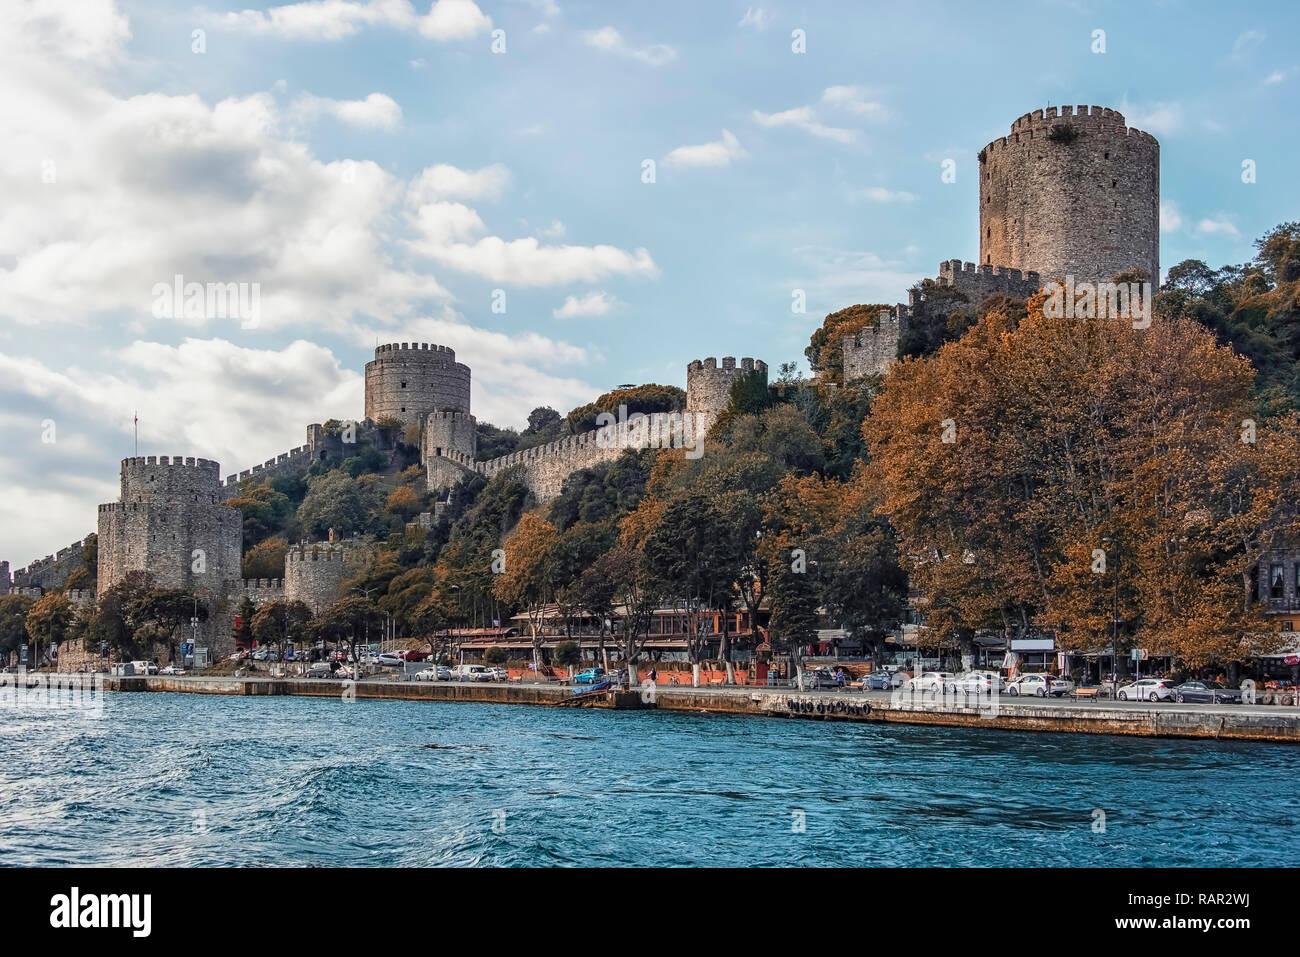 Rumelian Castle in Istanbul Stock Photo